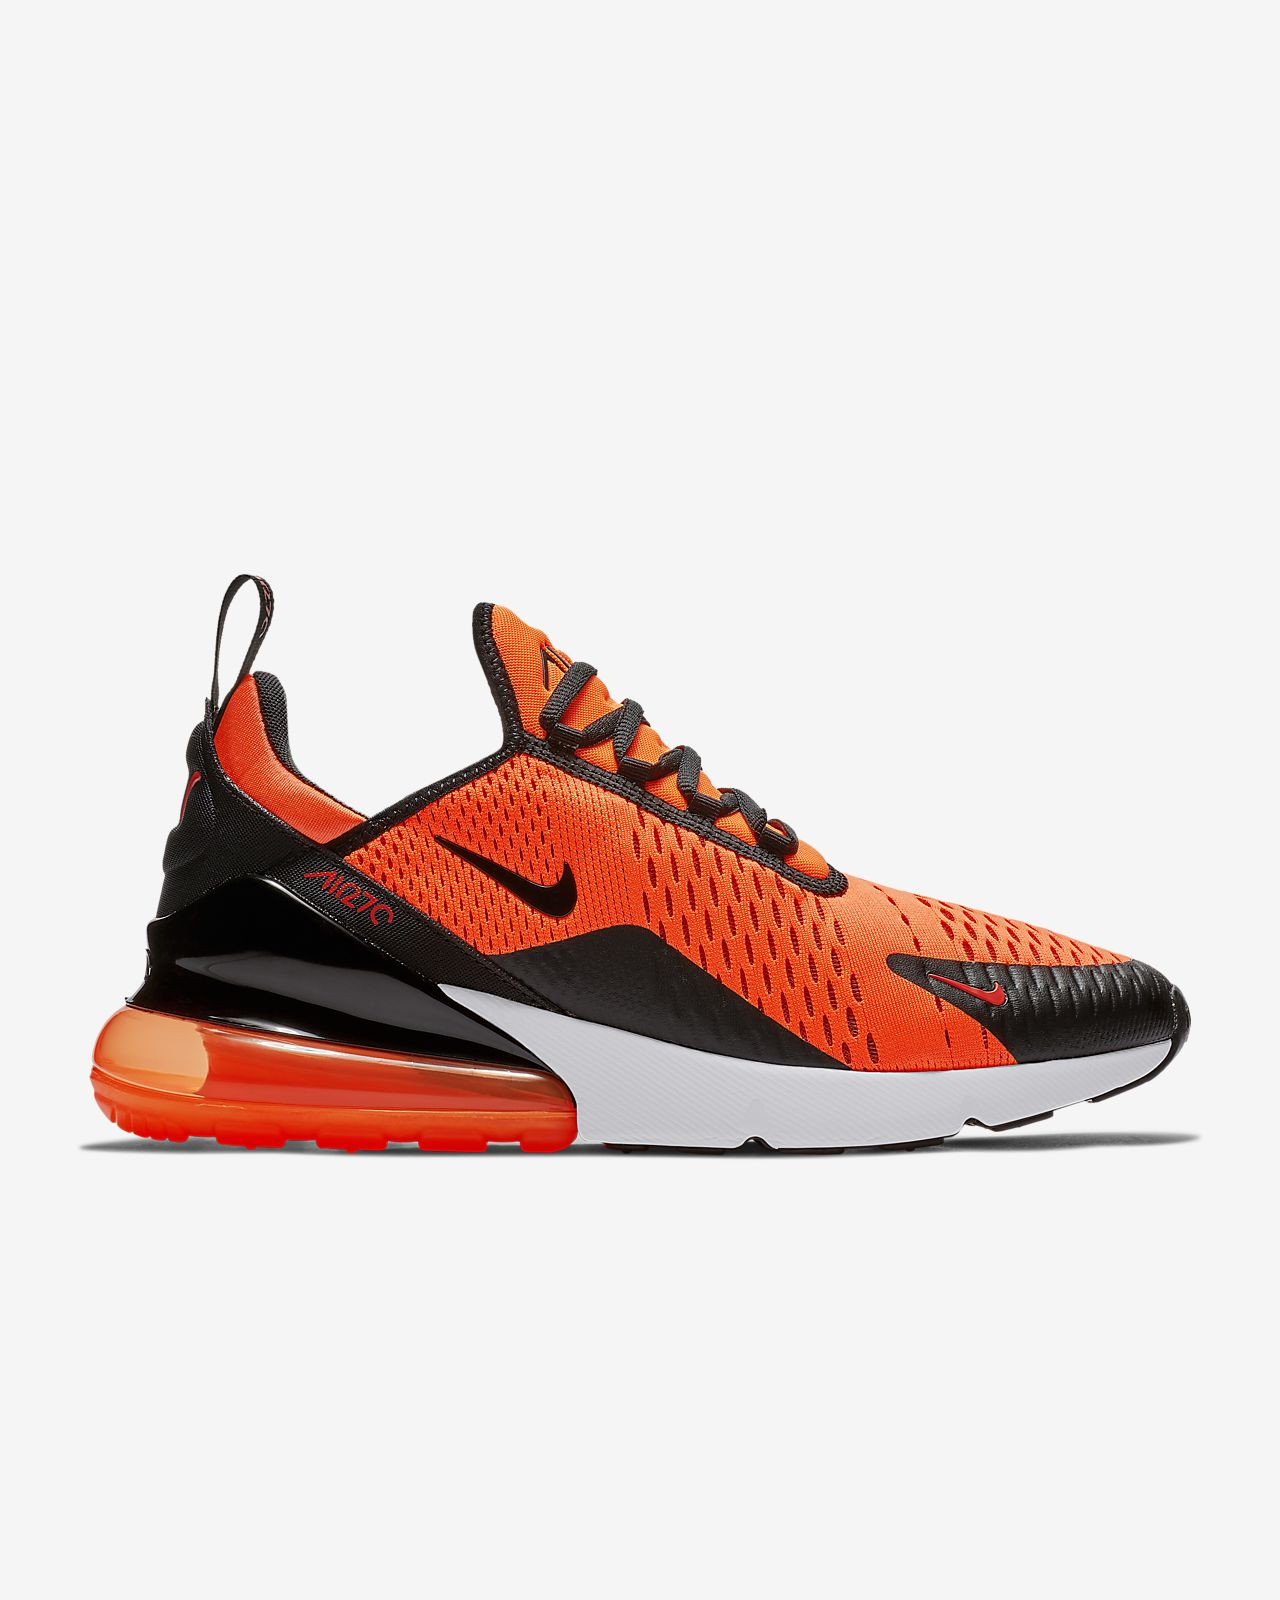 reputable site 7cd82 caac6 ... Nike Air Max 270 Mens Shoe